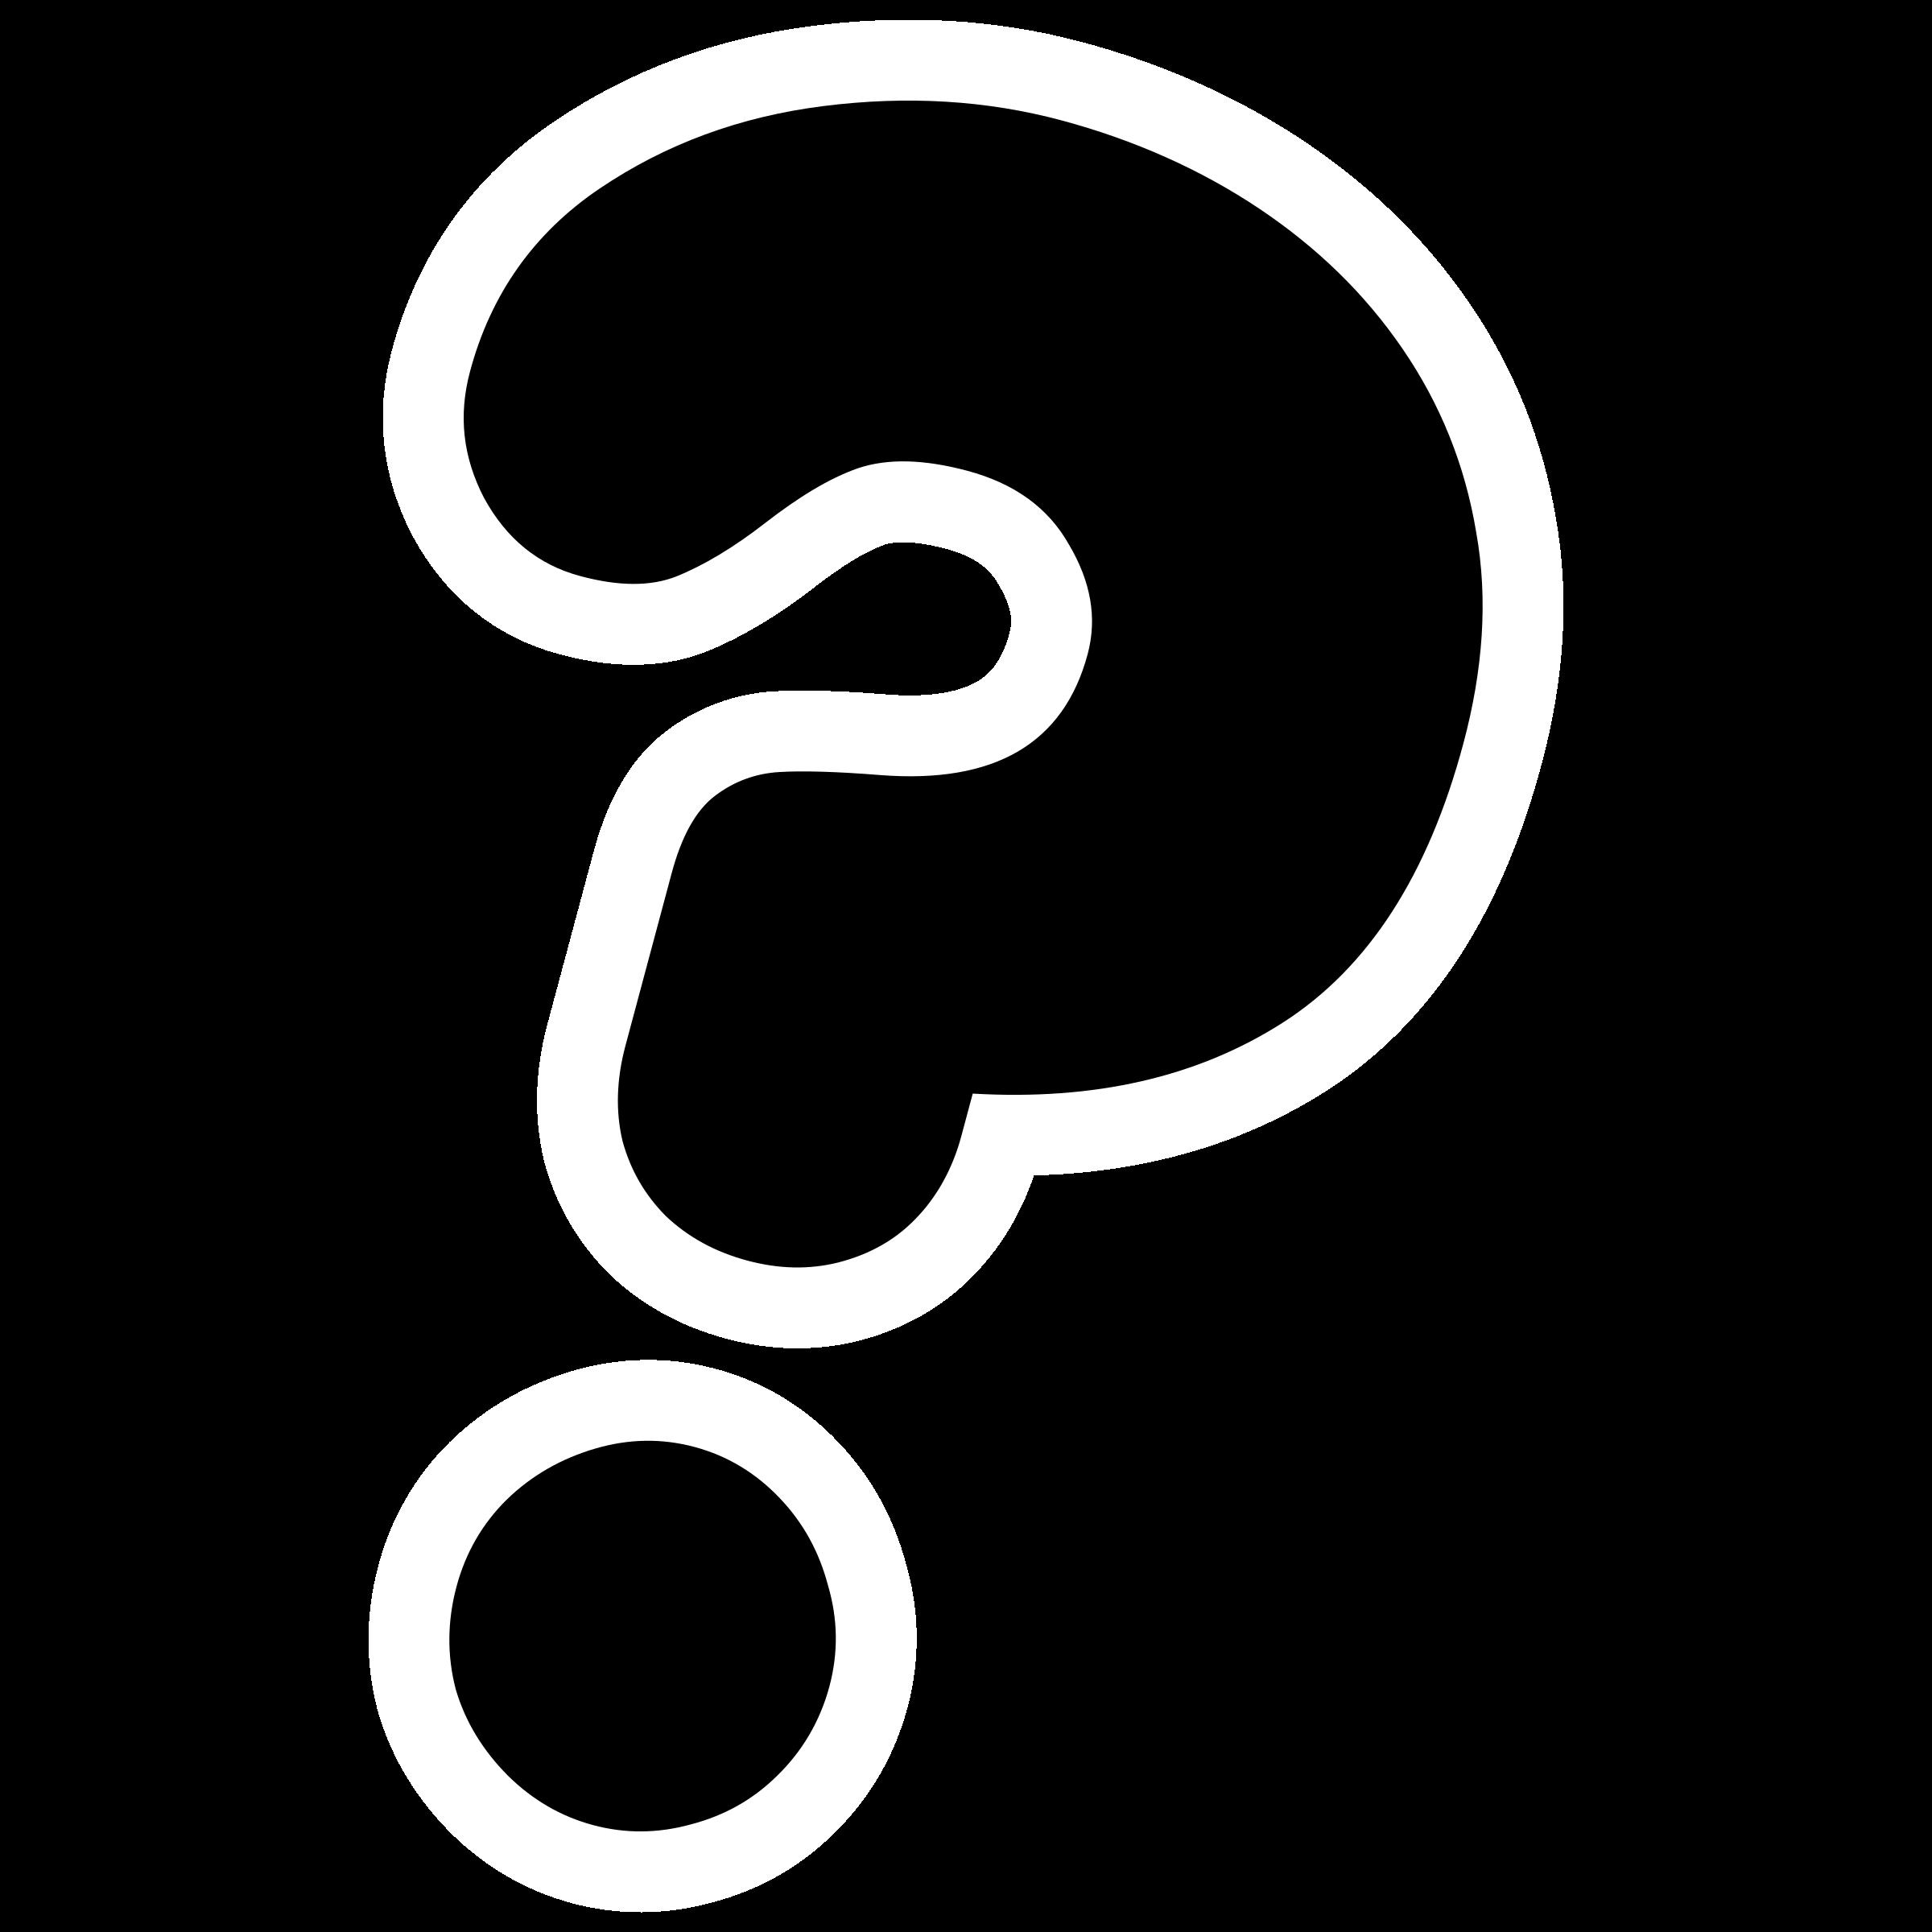 2400x2400 Questions Question Mark Clip Art Free Clipart Images 3